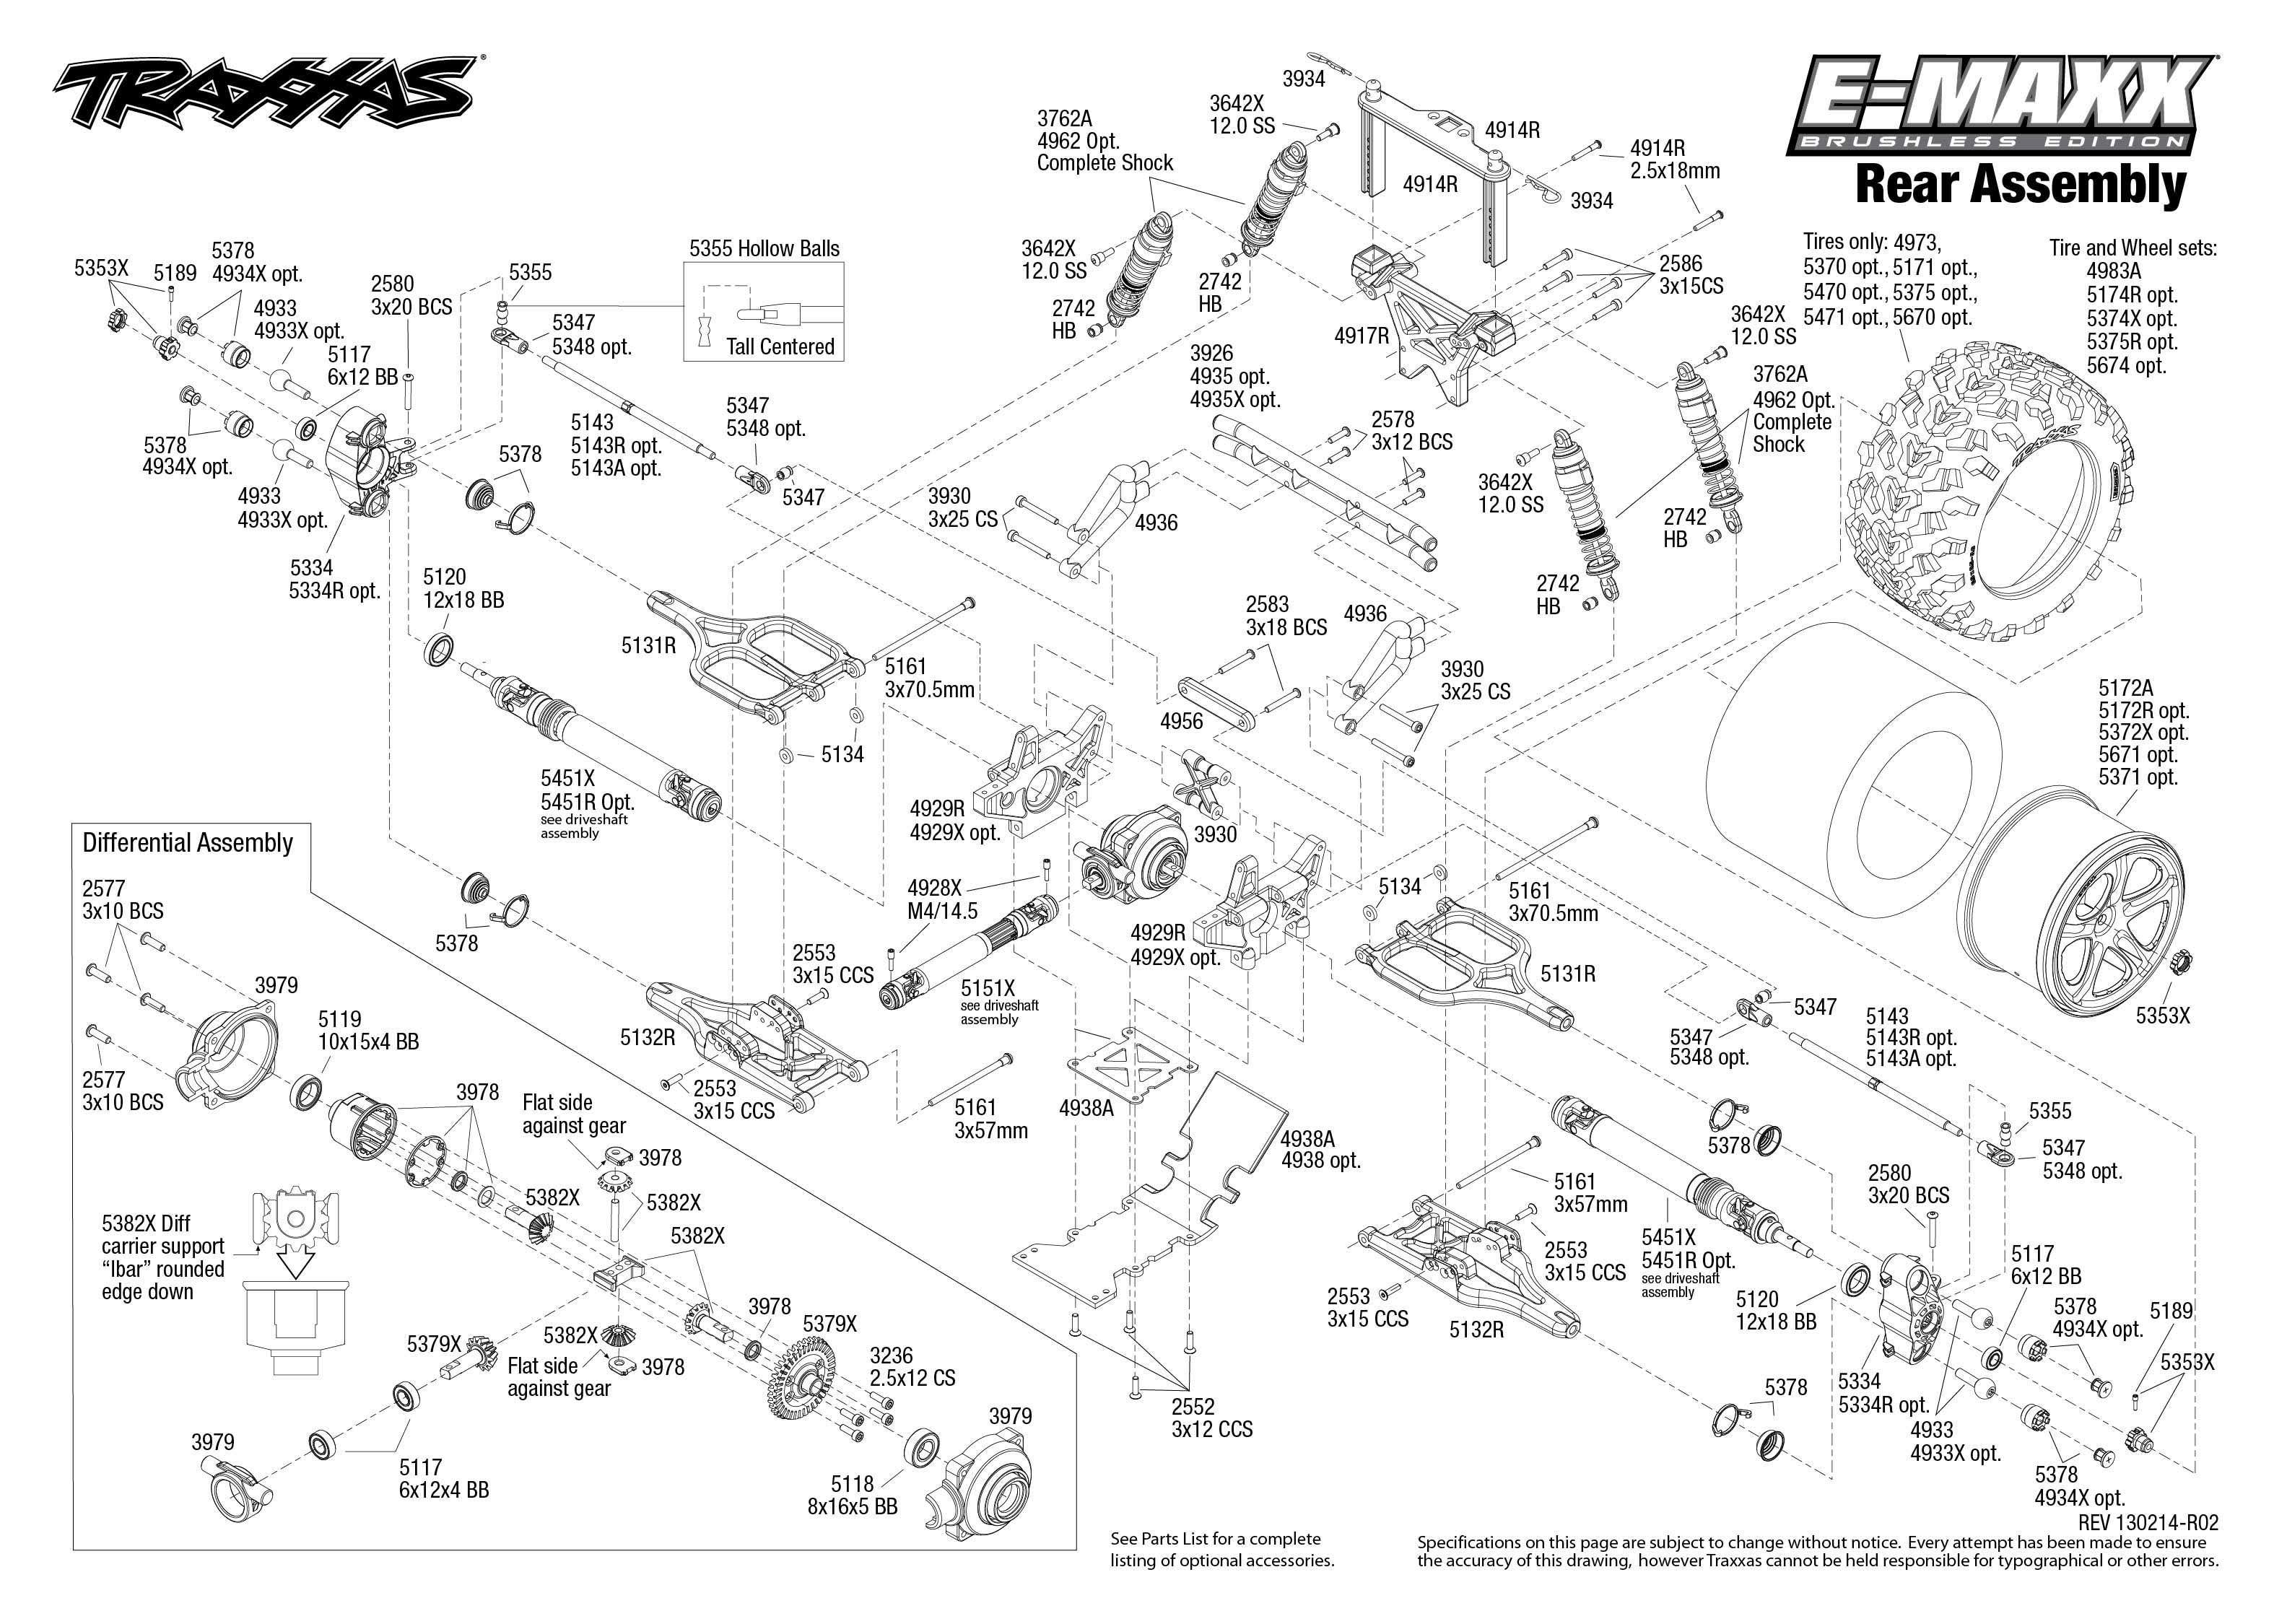 E Revo Brushless Parts Diagram Everything About Wiring Traxxas Stampede Vxl Achterkant 6708 Bouwtekening Maxx Trxxs List